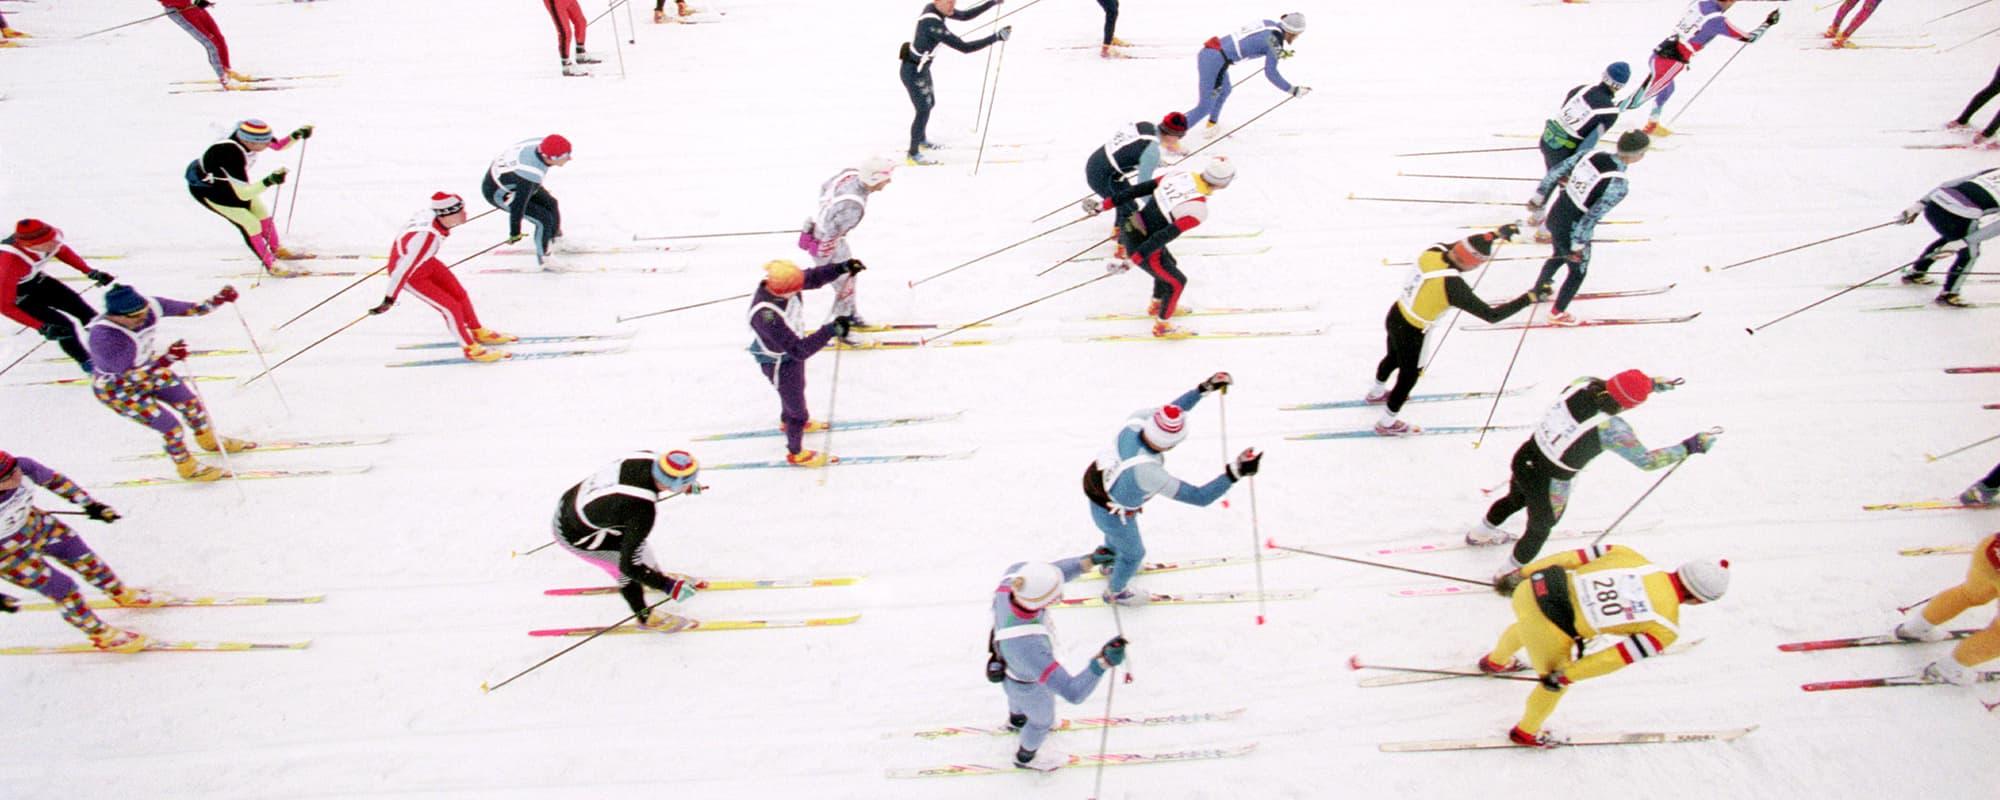 Finlandia-hiihto Lahdessa helmikuussa 1997.